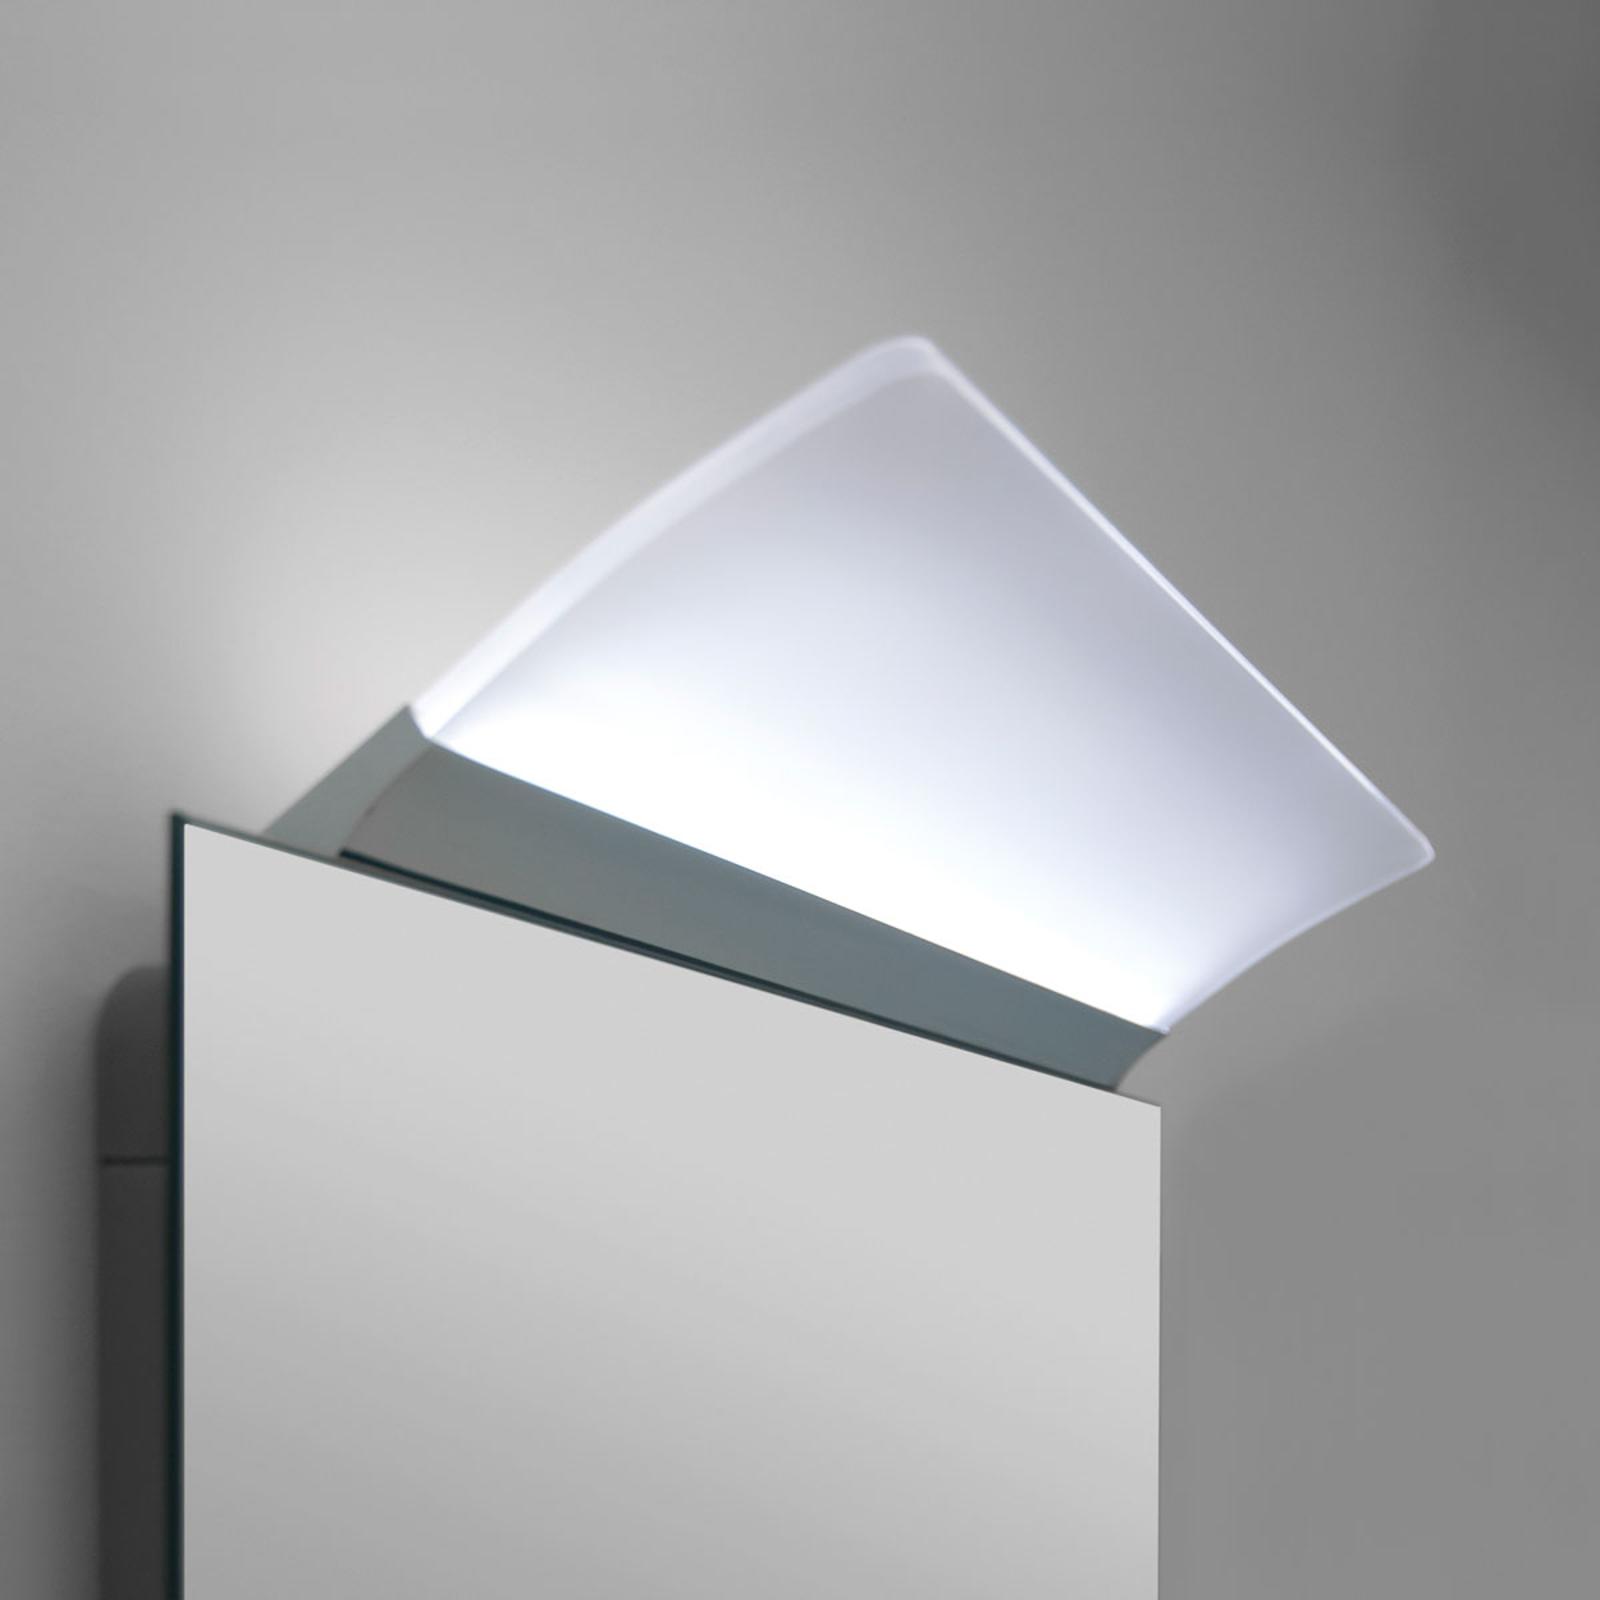 Bredd LED-spegellampa Angela, IP44, 30 cm